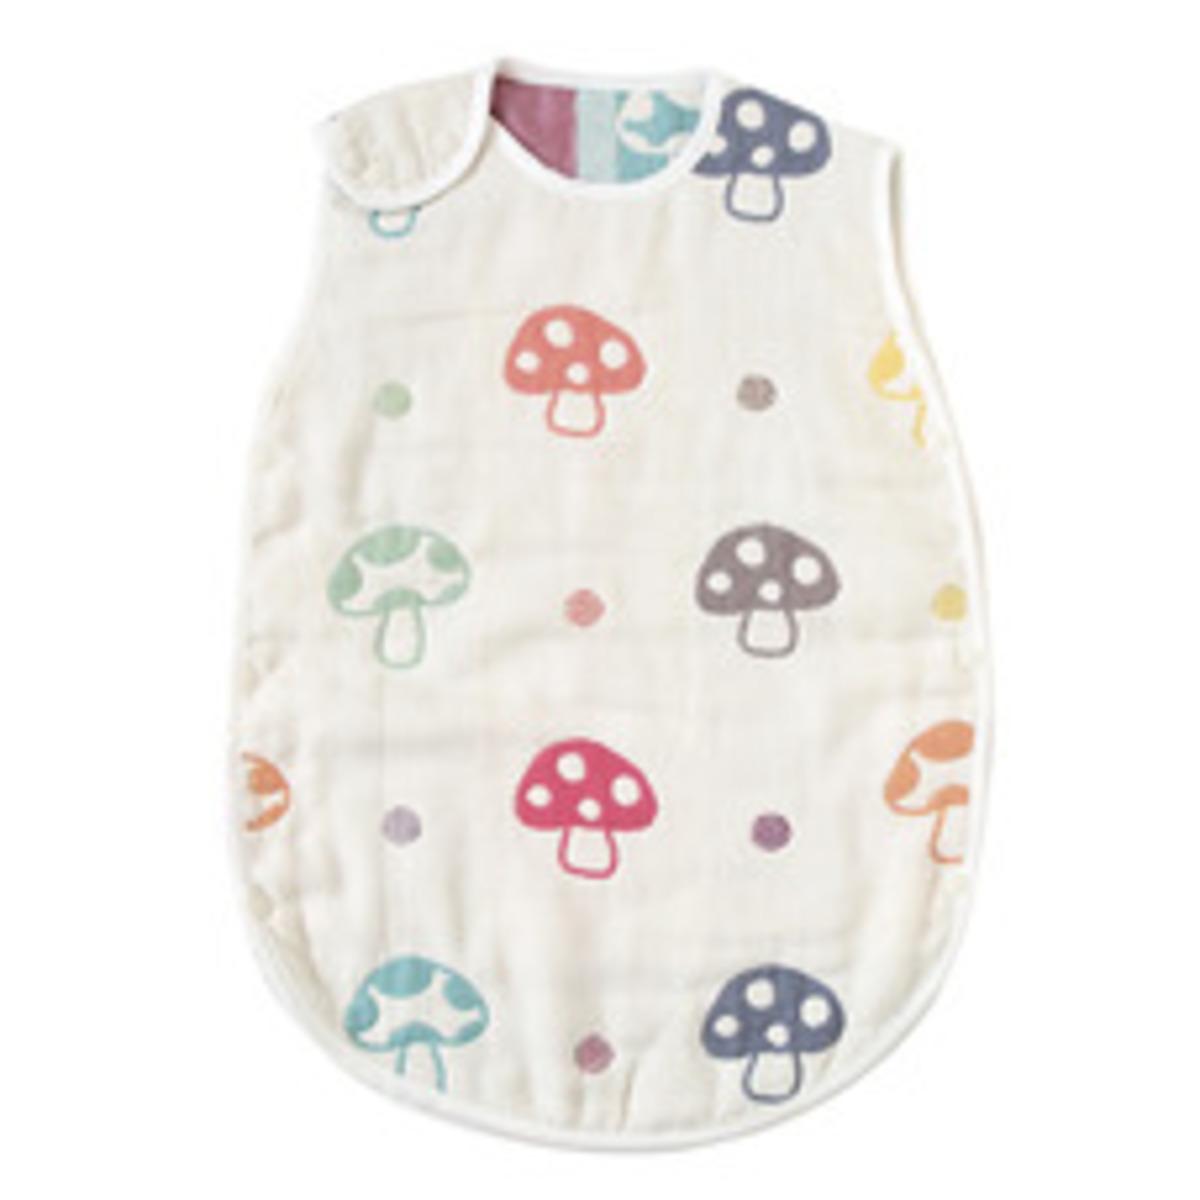 Made in Japan 6 Layers Yarn Baby Sleeping Vest ( 0-3 yrs )  4534688072258